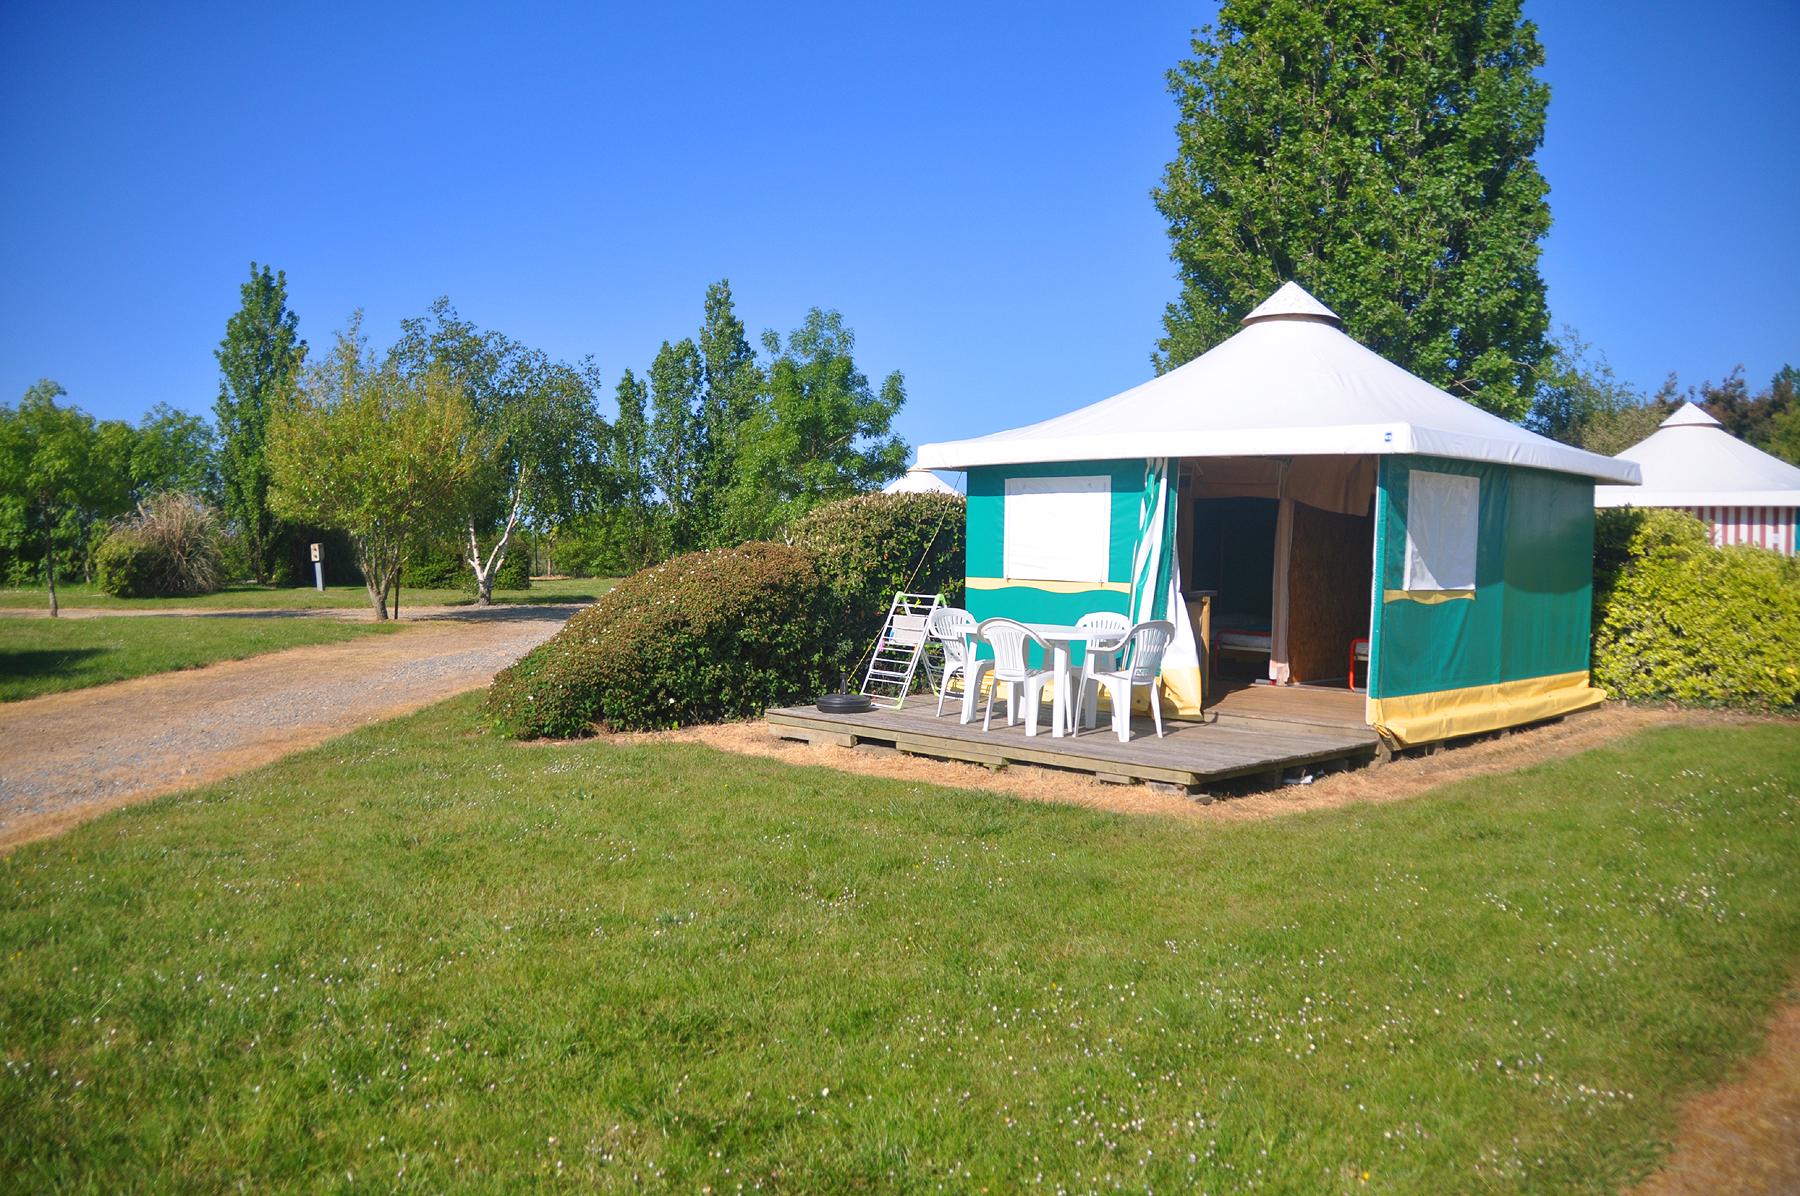 location camping bungalow toile sarzeau morbihan 56 With village vacances morbihan avec piscine 8 location camping bungalow toile sarzeau morbihan 56